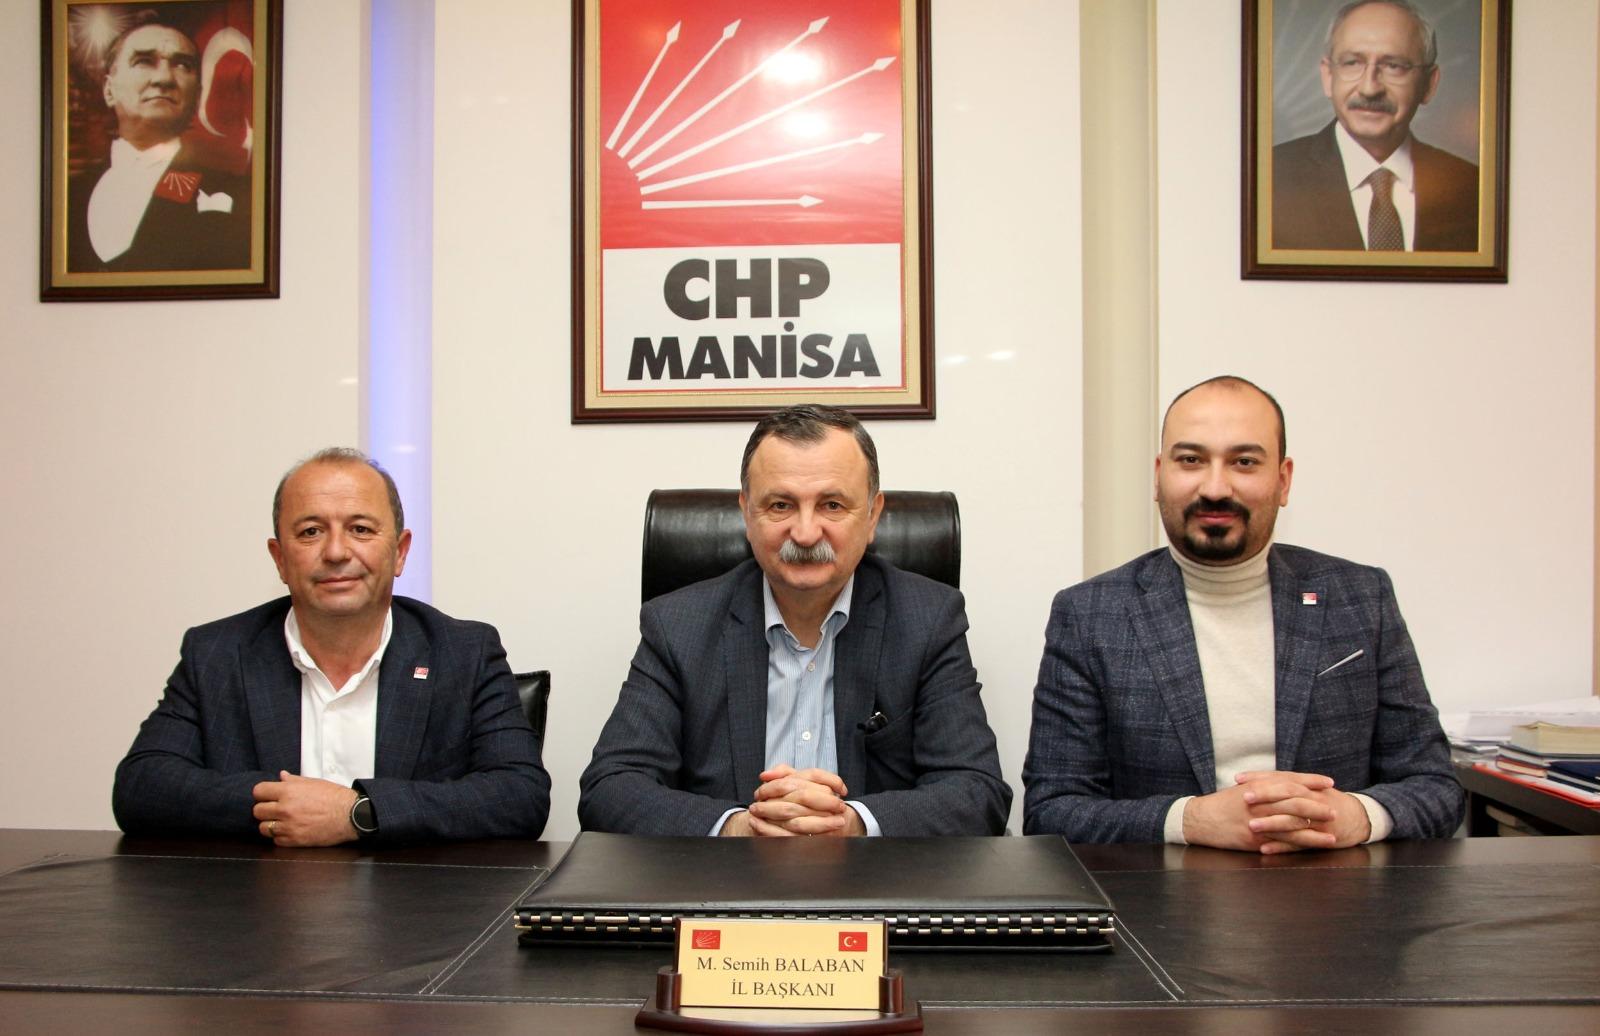 CHP'den Cumhur İttifakı'na Sert Eleştiri